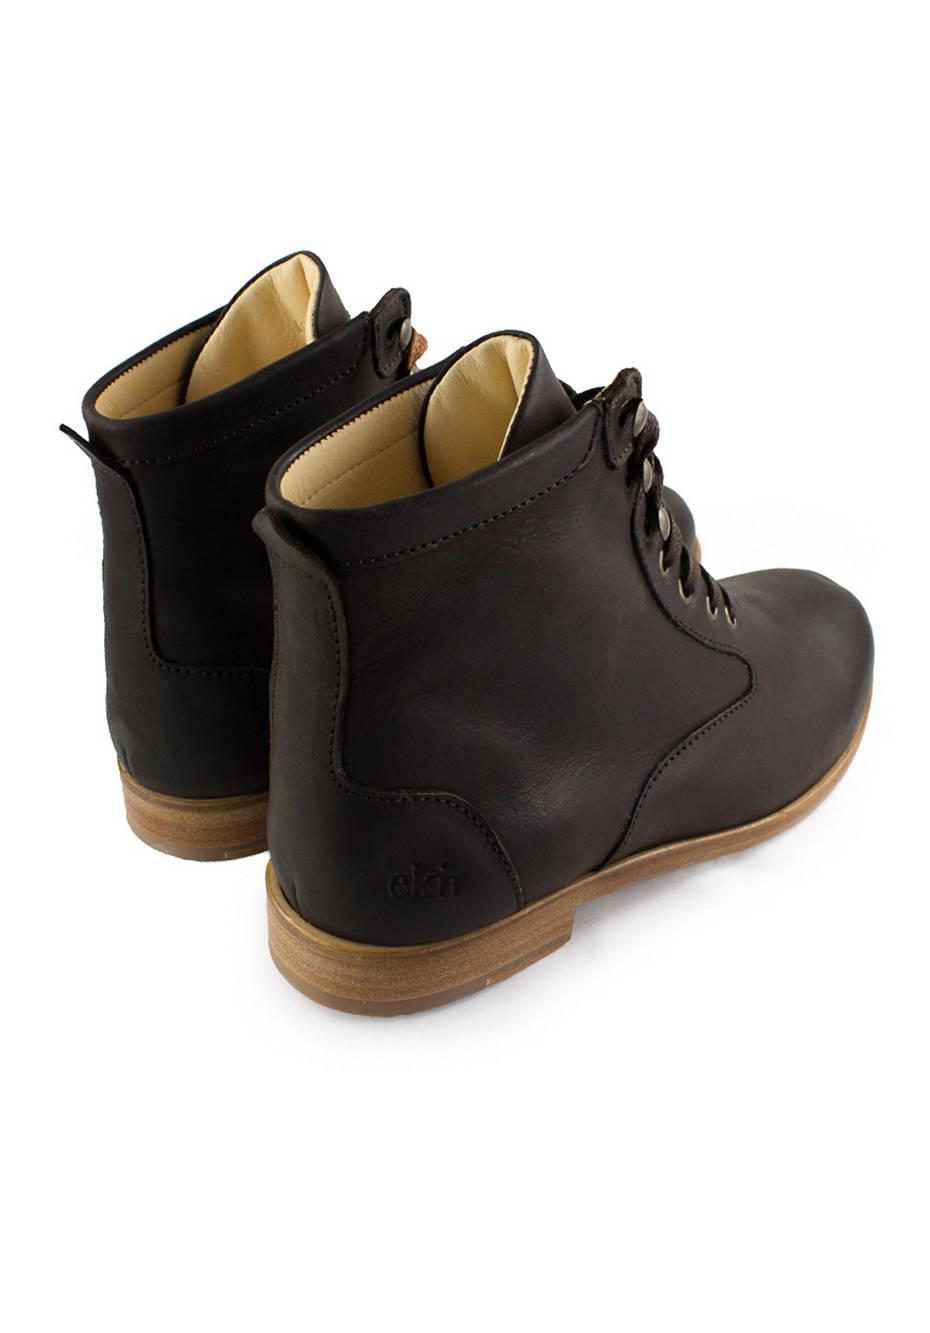 Desert High / Brown Leather